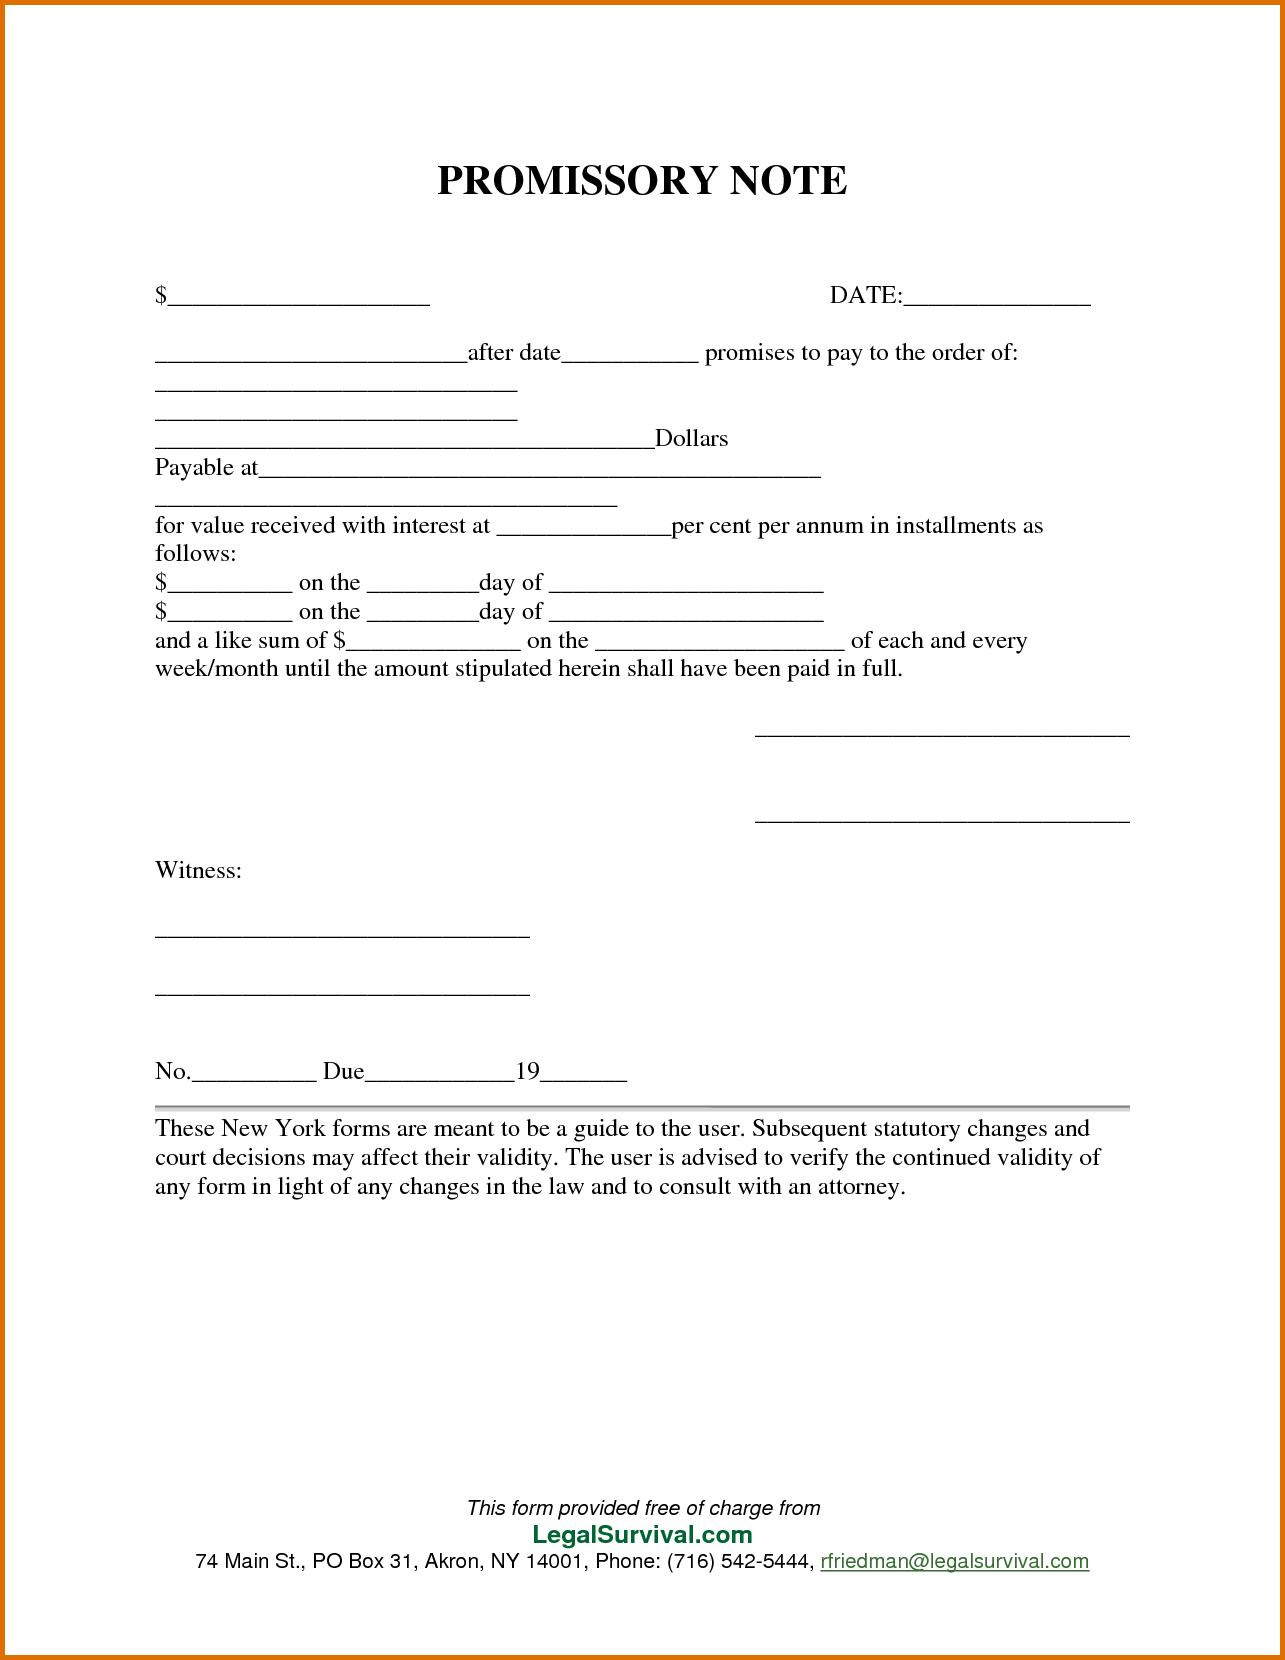 006 Template Ideas Free Promissory Note For Personal Loan - Free Printable Promissory Note For Personal Loan